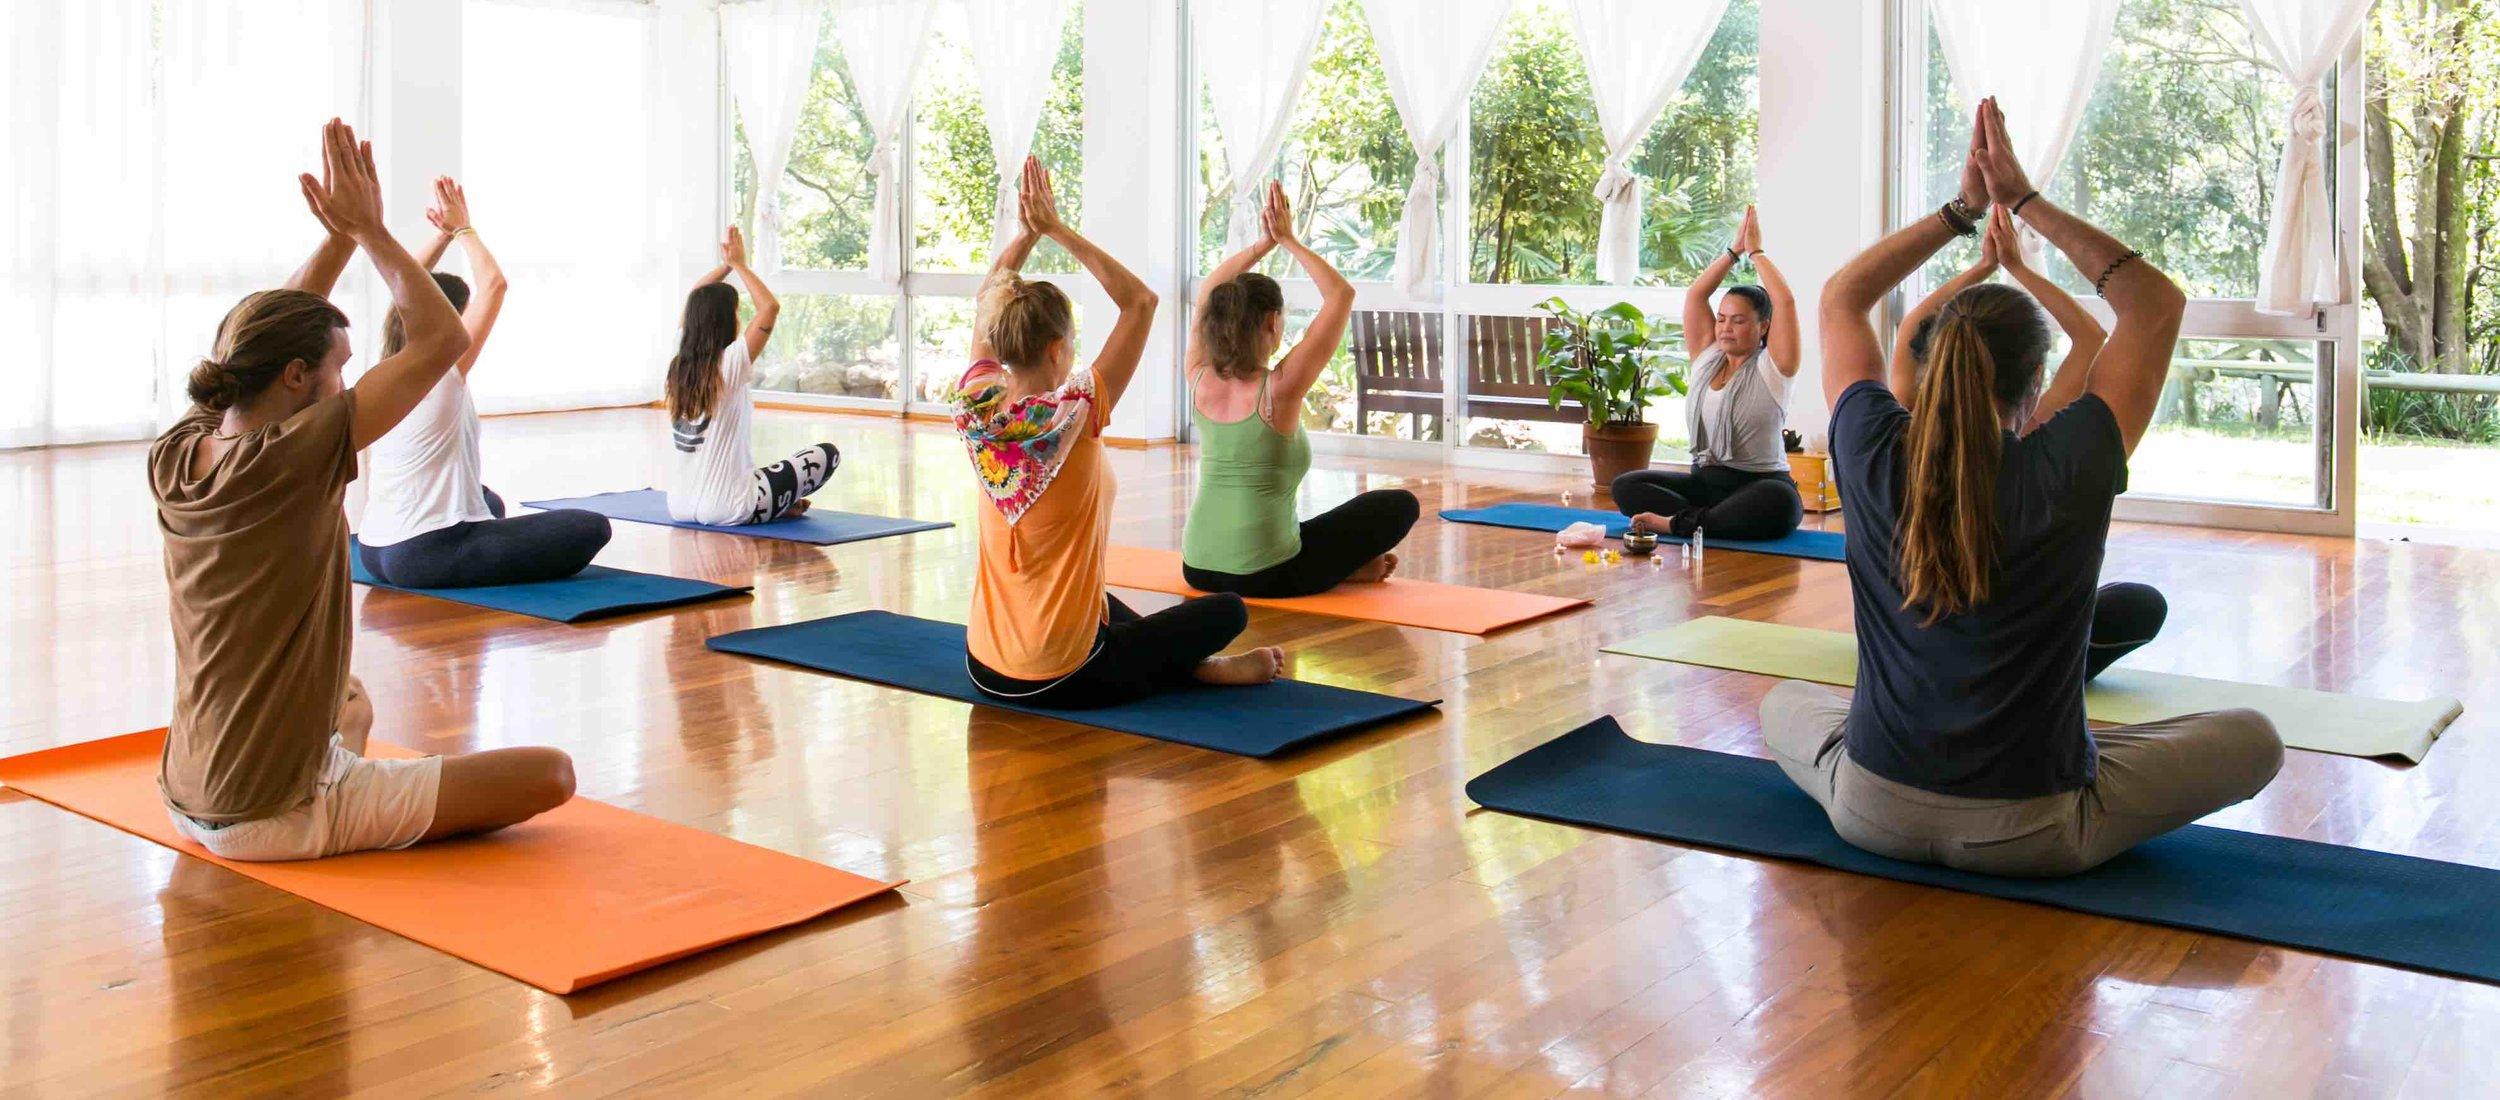 Yoga Zach 1.jpg